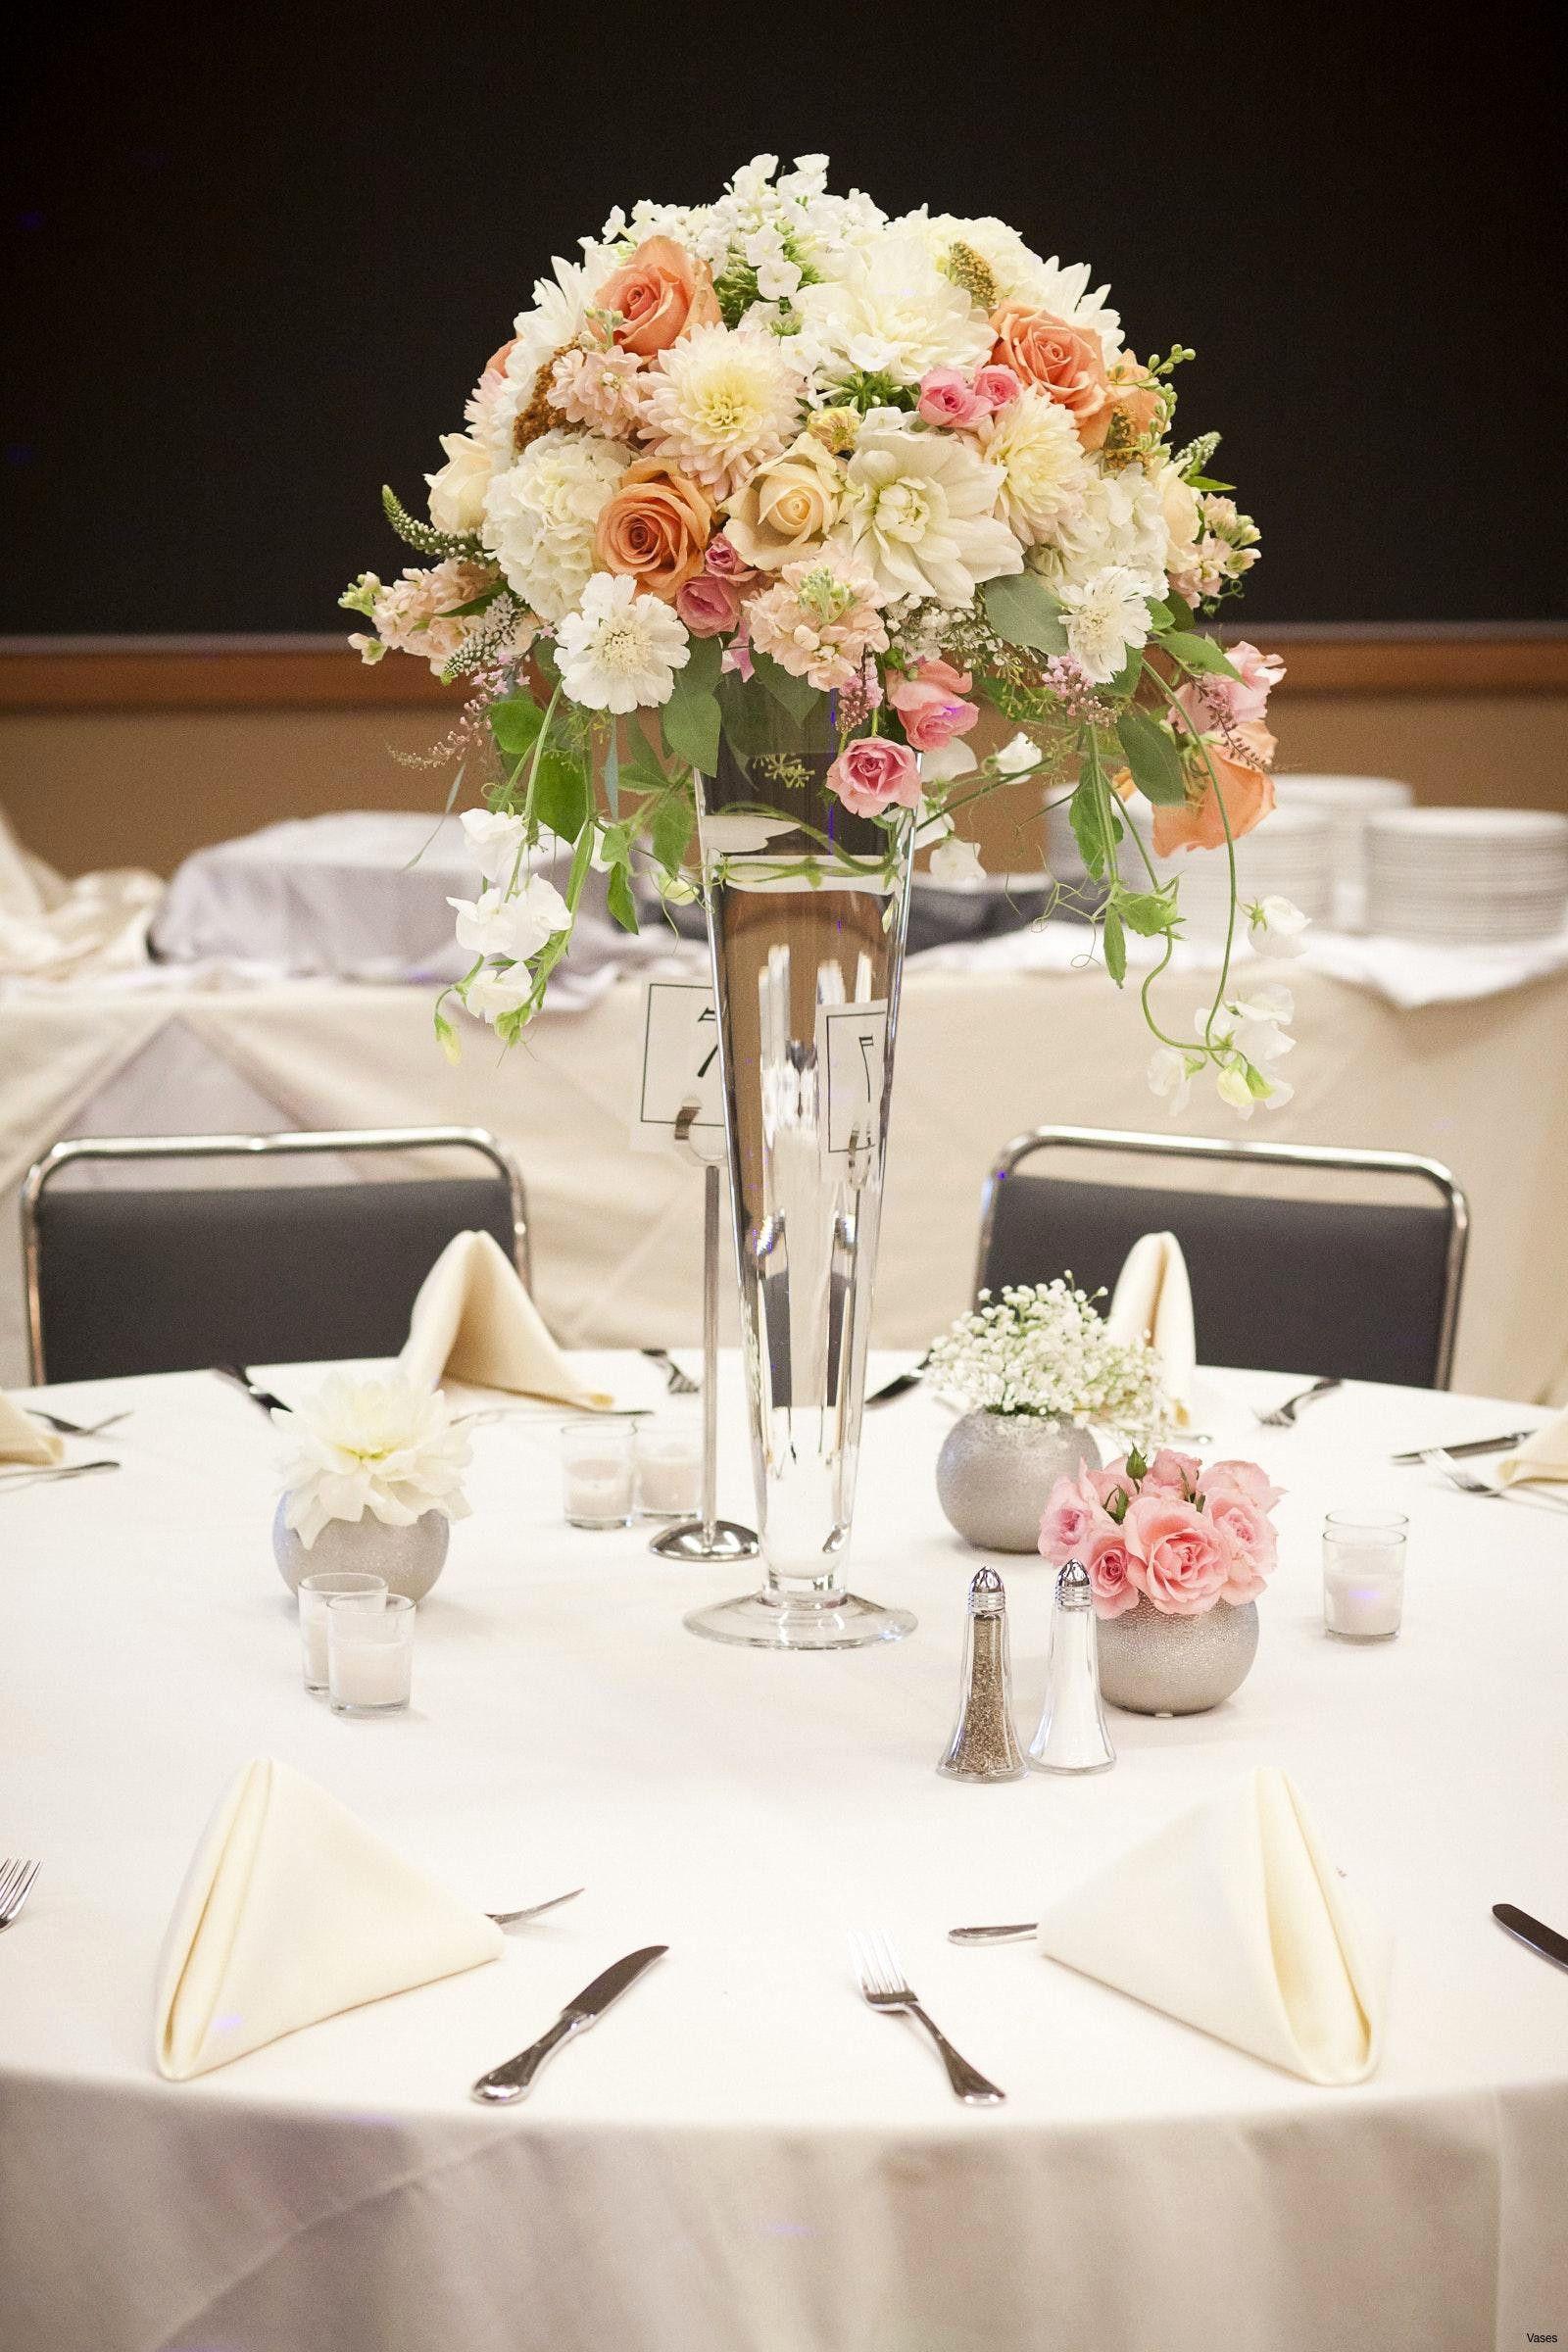 large vase filler ideas of 30 pearl vase fillers the weekly world for 30 pearl vase fillers